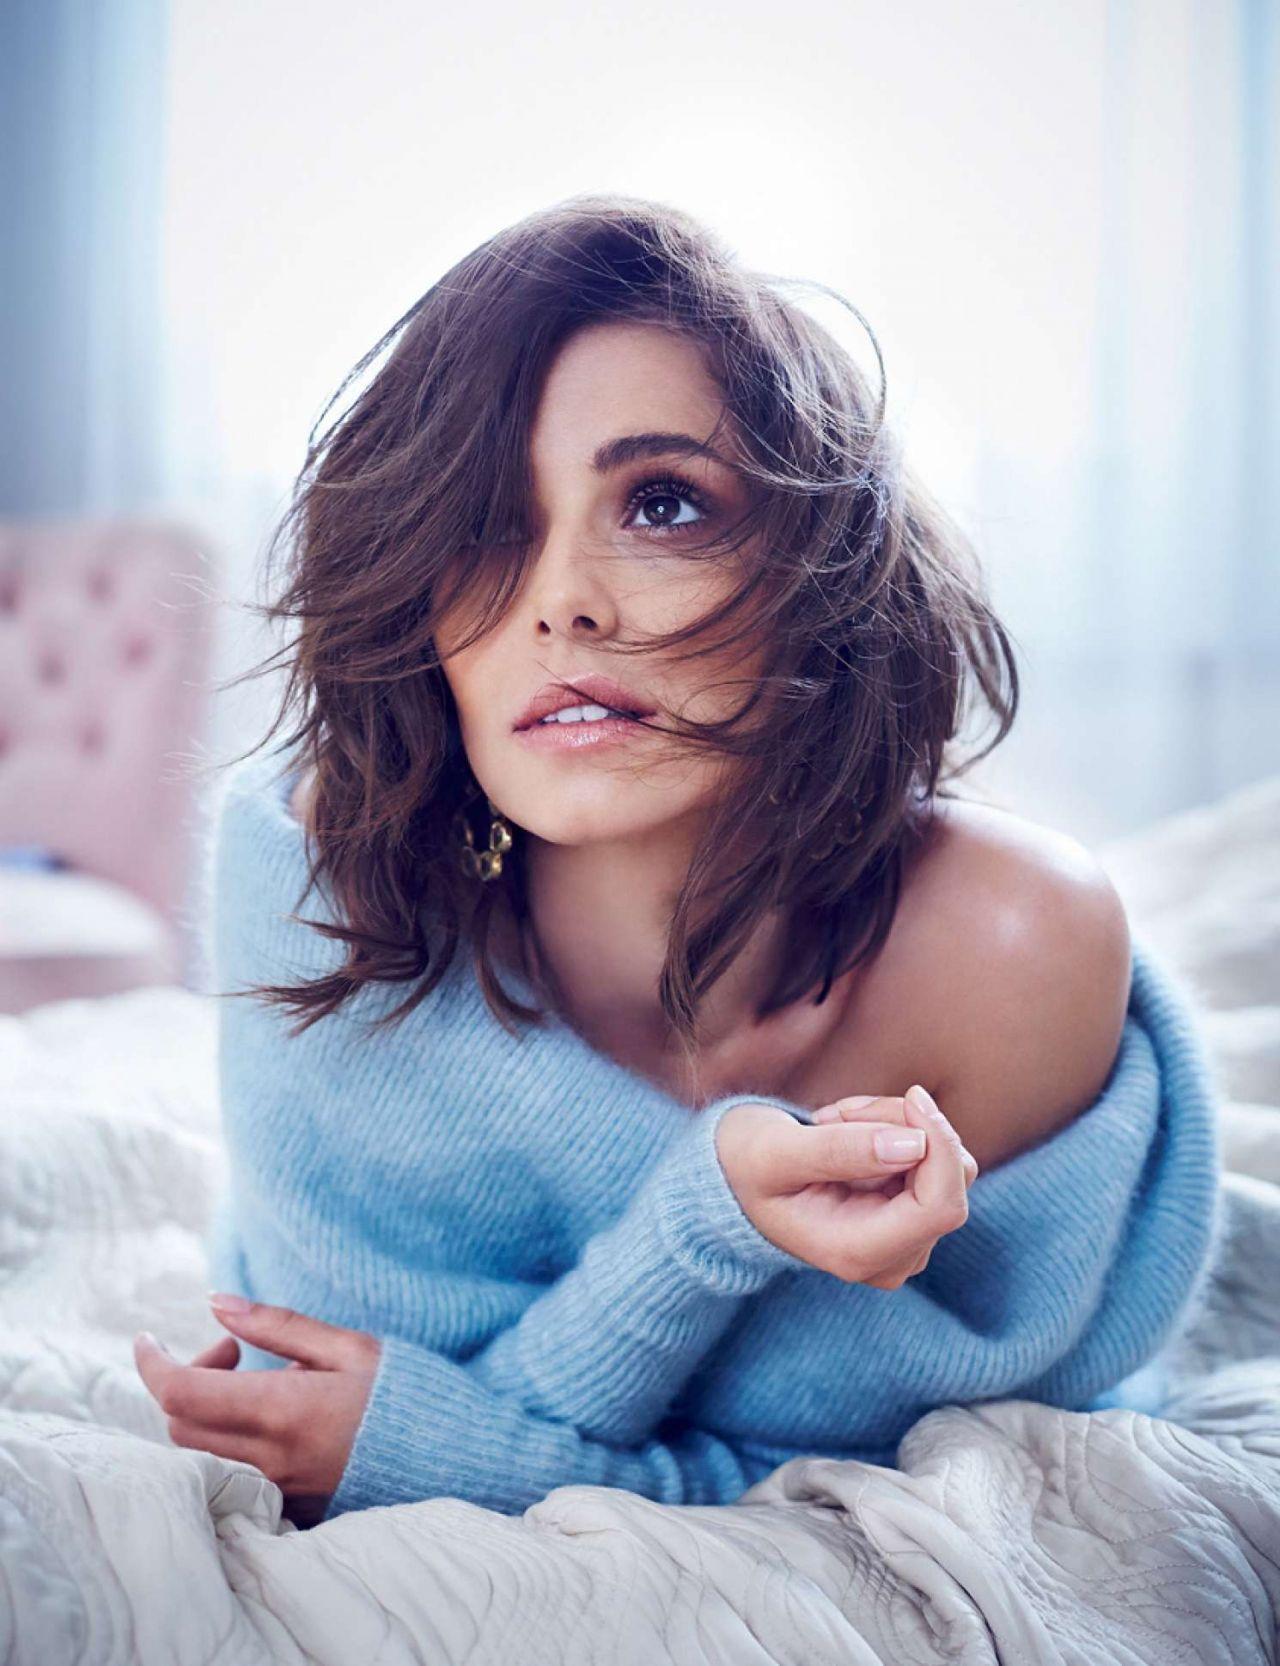 Cheryl Fernandez-Versini nudes (83 photos), leaked Paparazzi, iCloud, braless 2017